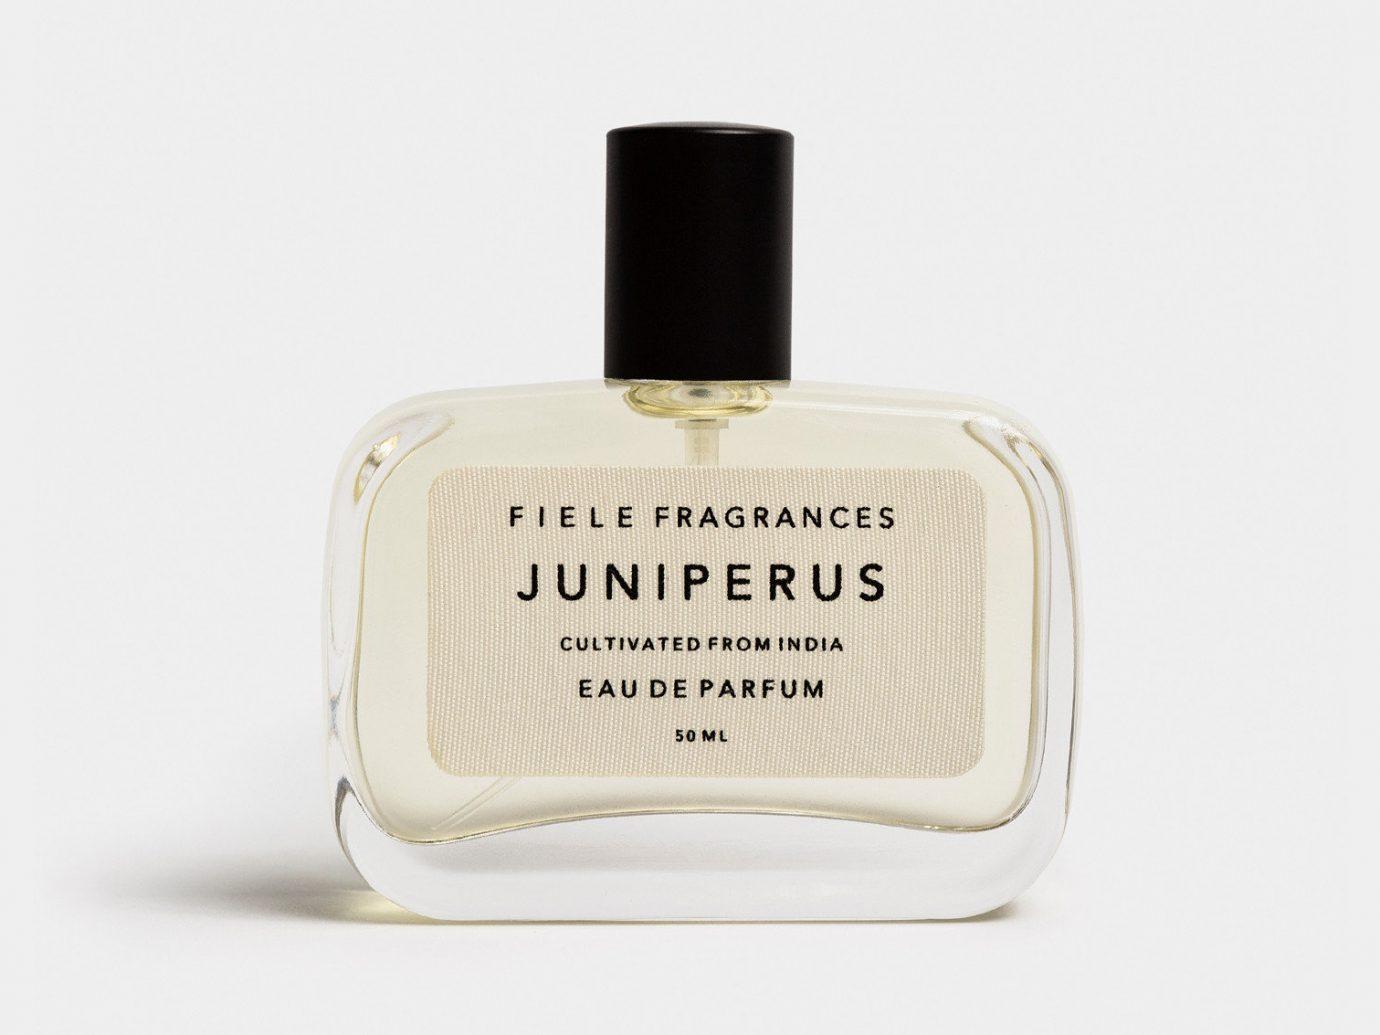 Beauty Health + Wellness Travel Shop toiletry perfume indoor product cosmetics product design health & beauty